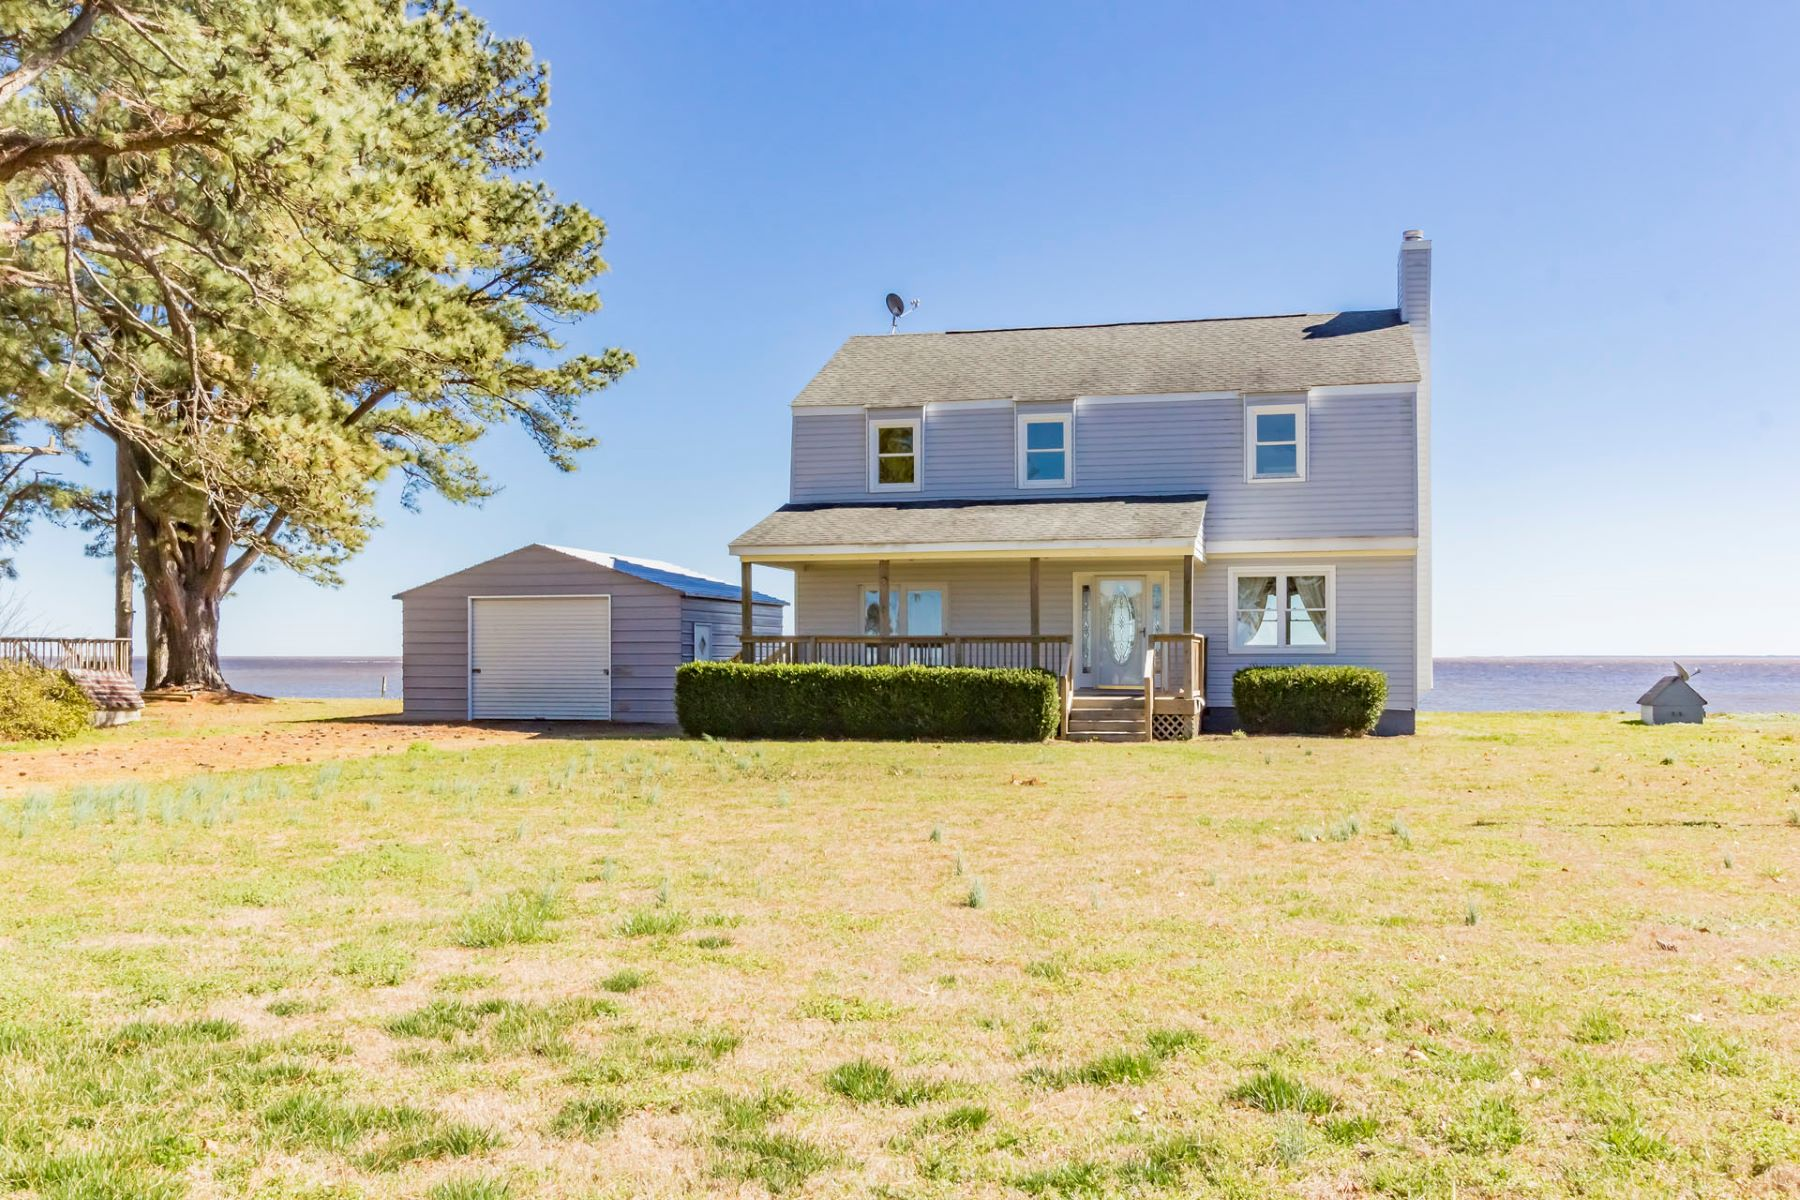 Single Family Homes for Active at 108 Soundside Drive Hertford, North Carolina 27944 United States